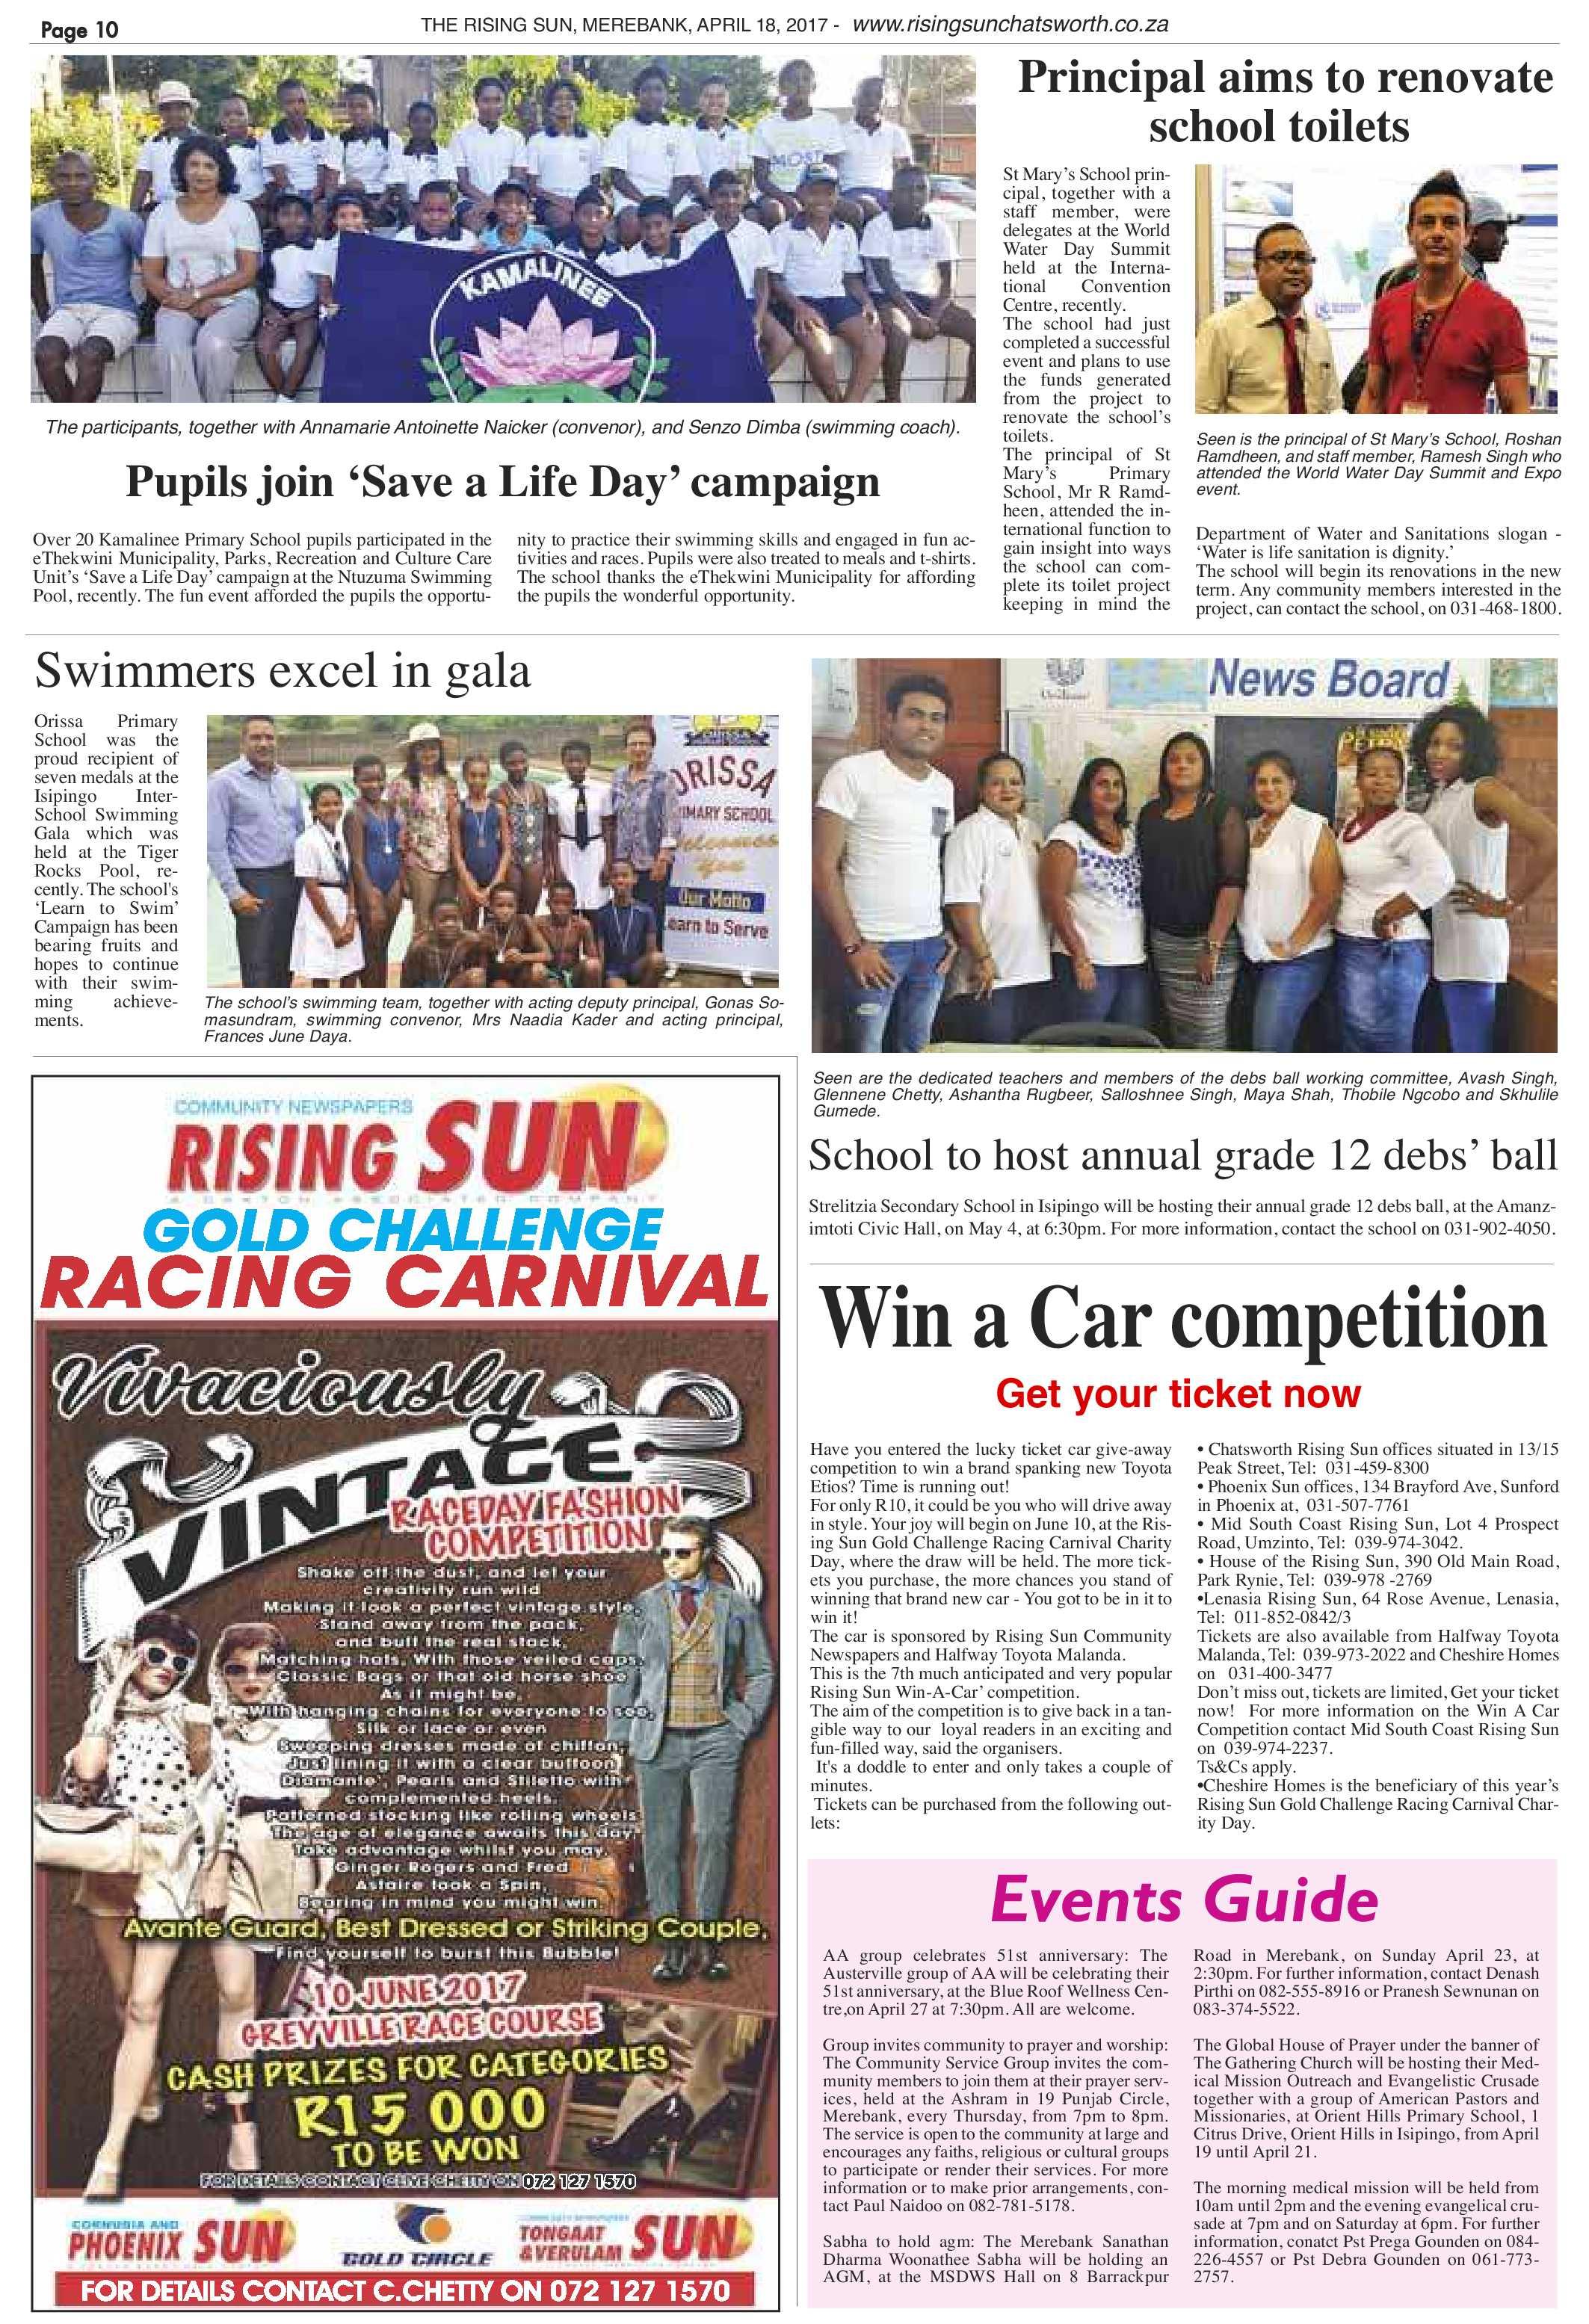 merebank-april-18-epapers-page-10